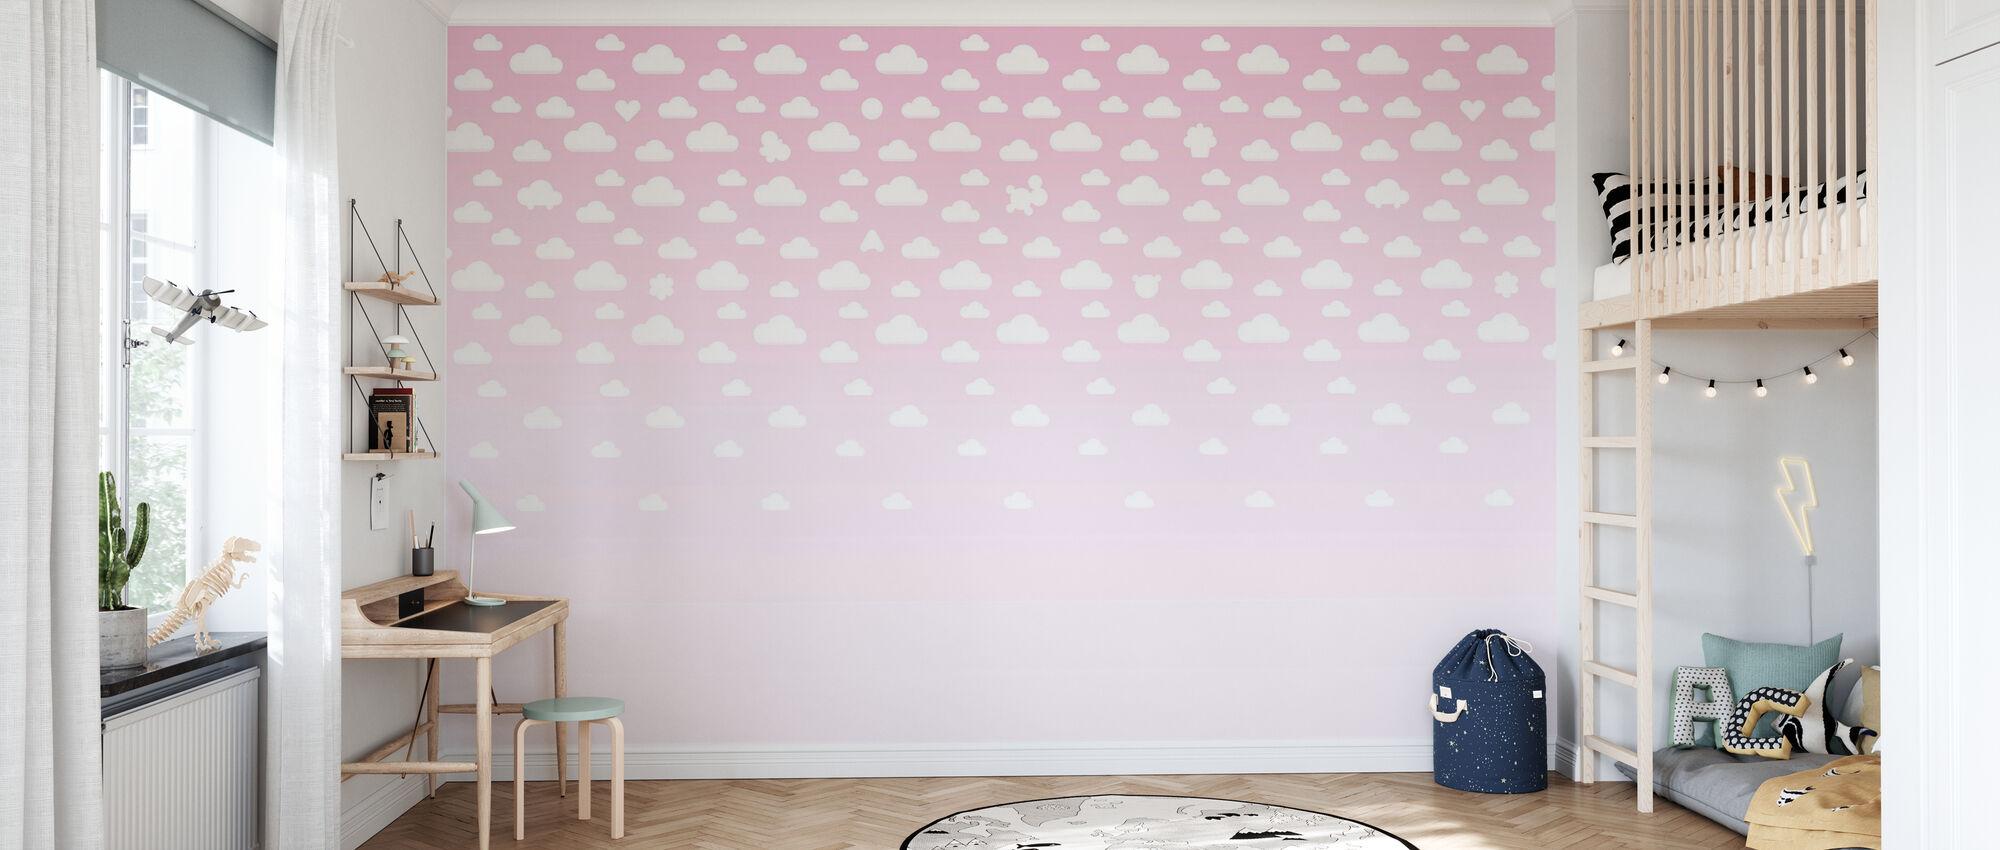 Cloudspotting Rosa - Tapet - Barnrum